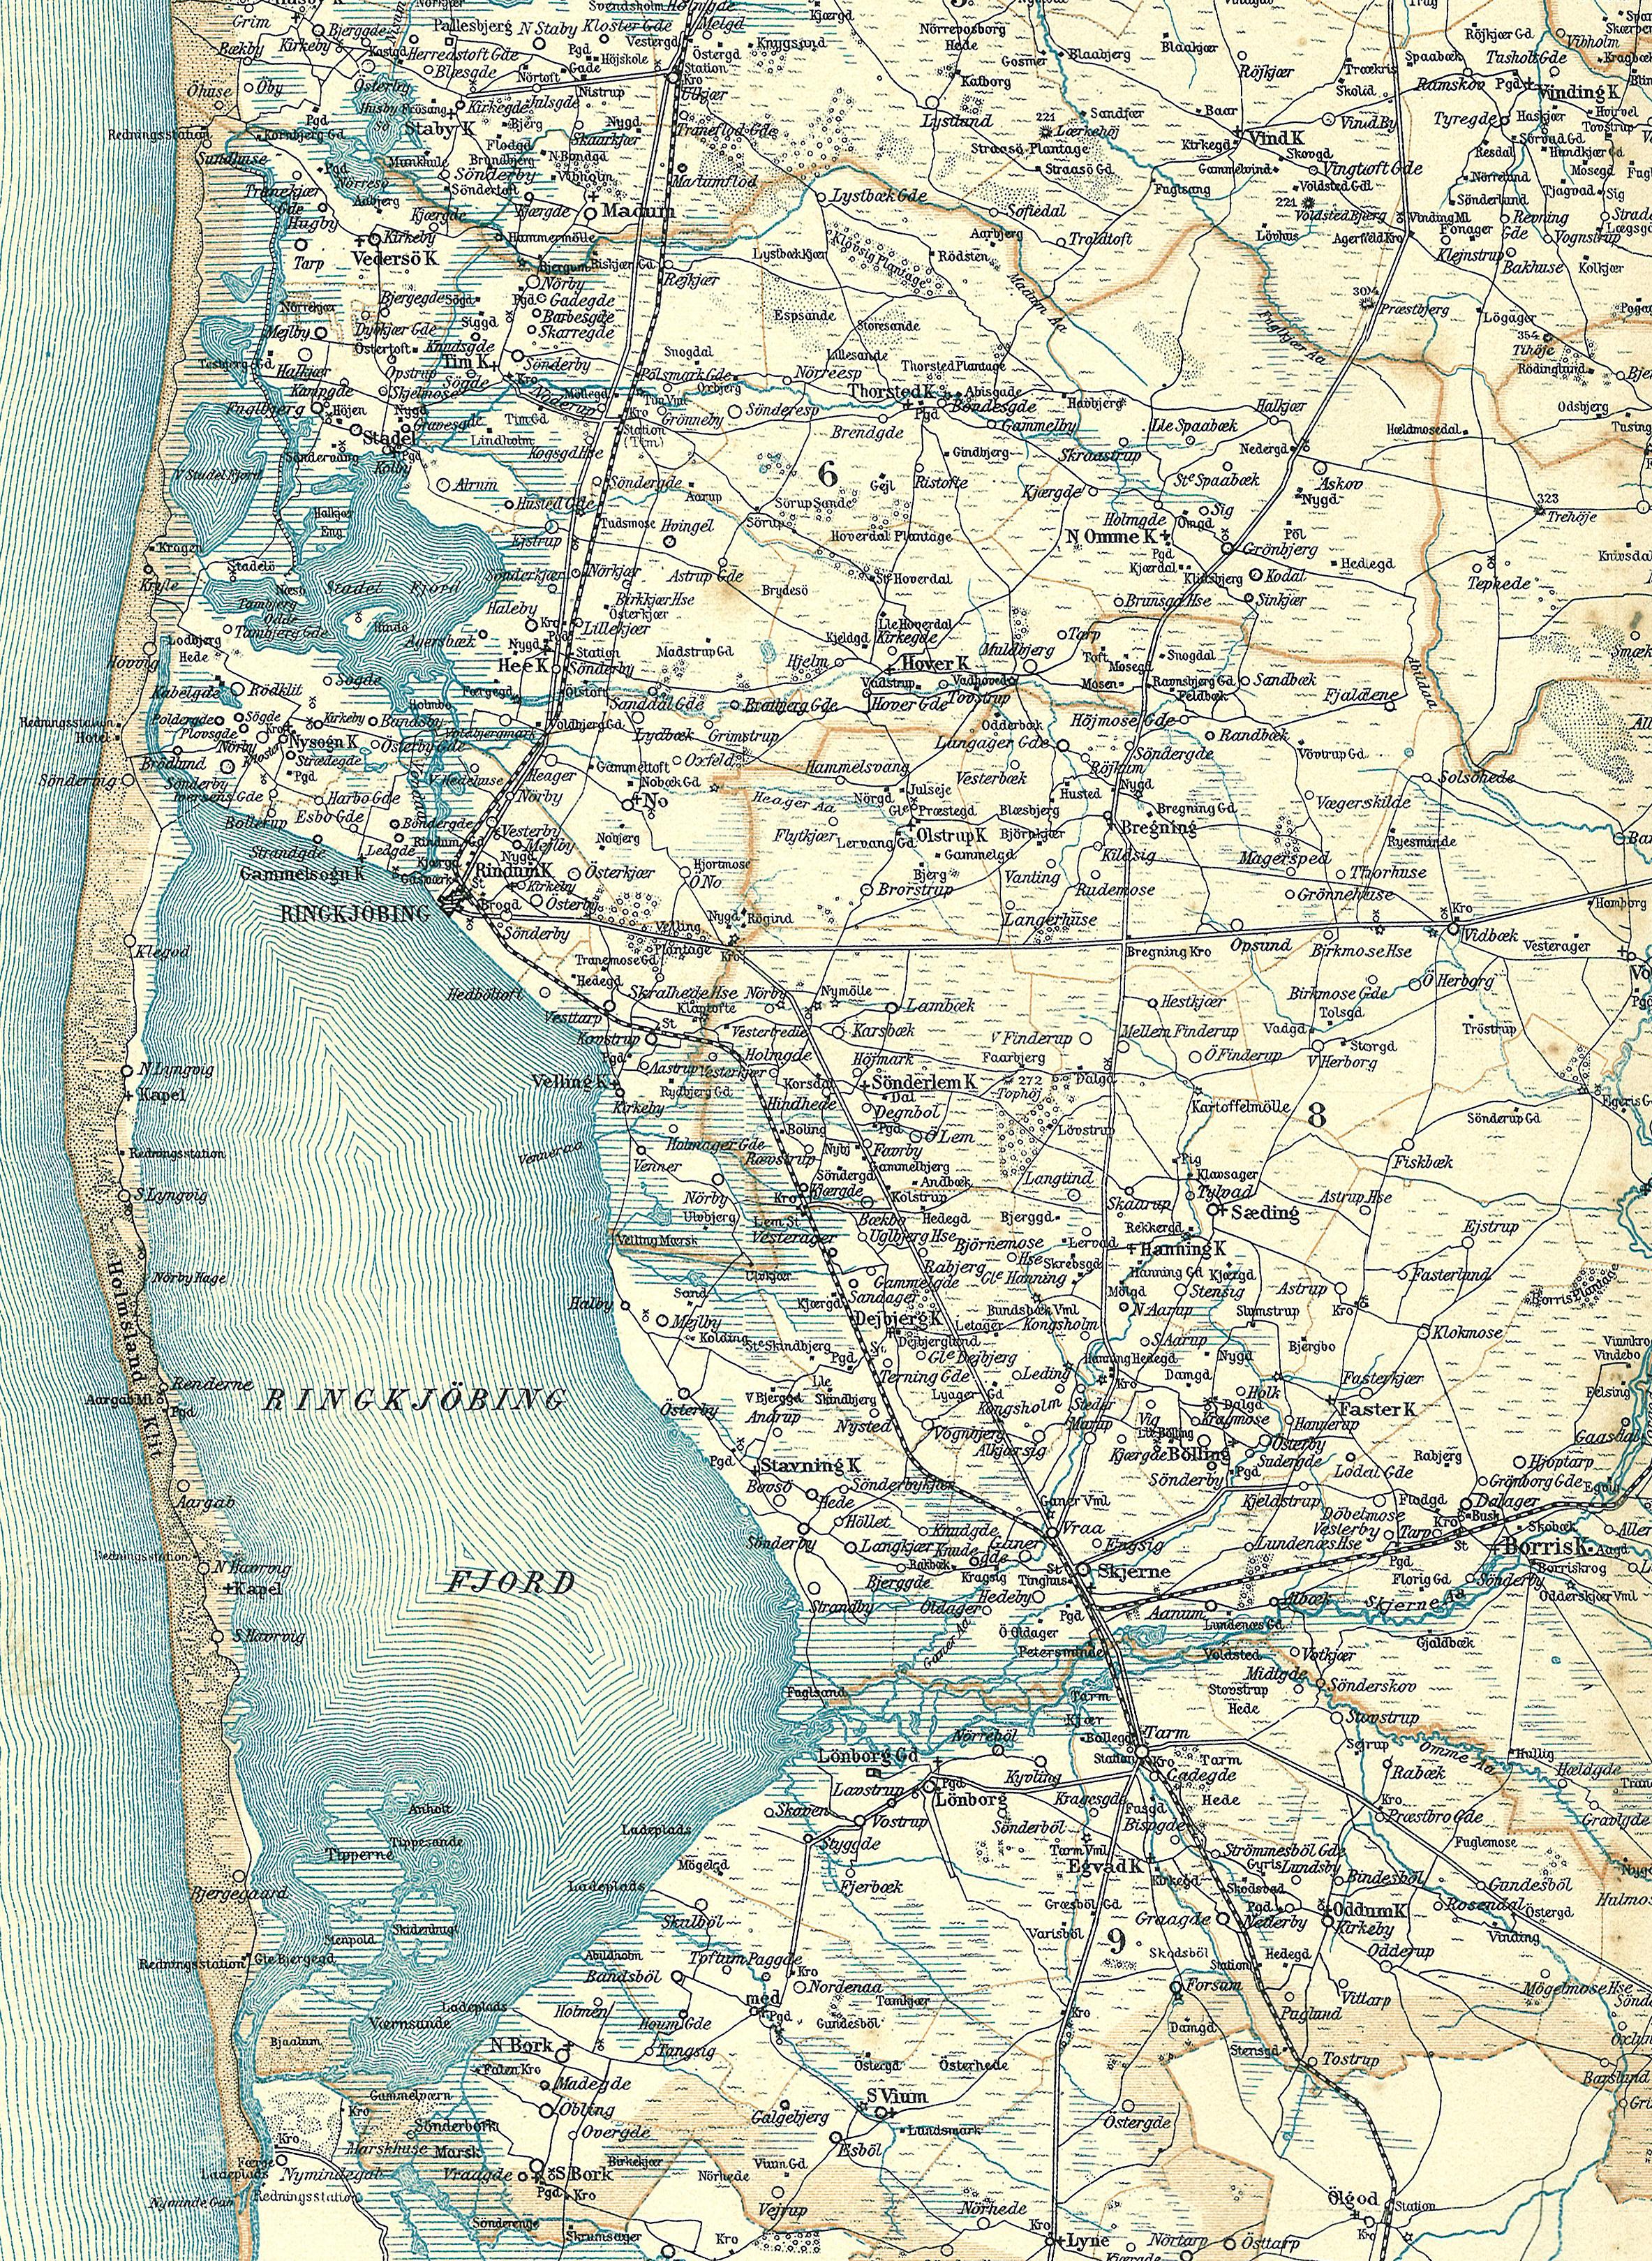 File Hind Herred Ringkobing Amt Syd Jpg Wikimedia Commons